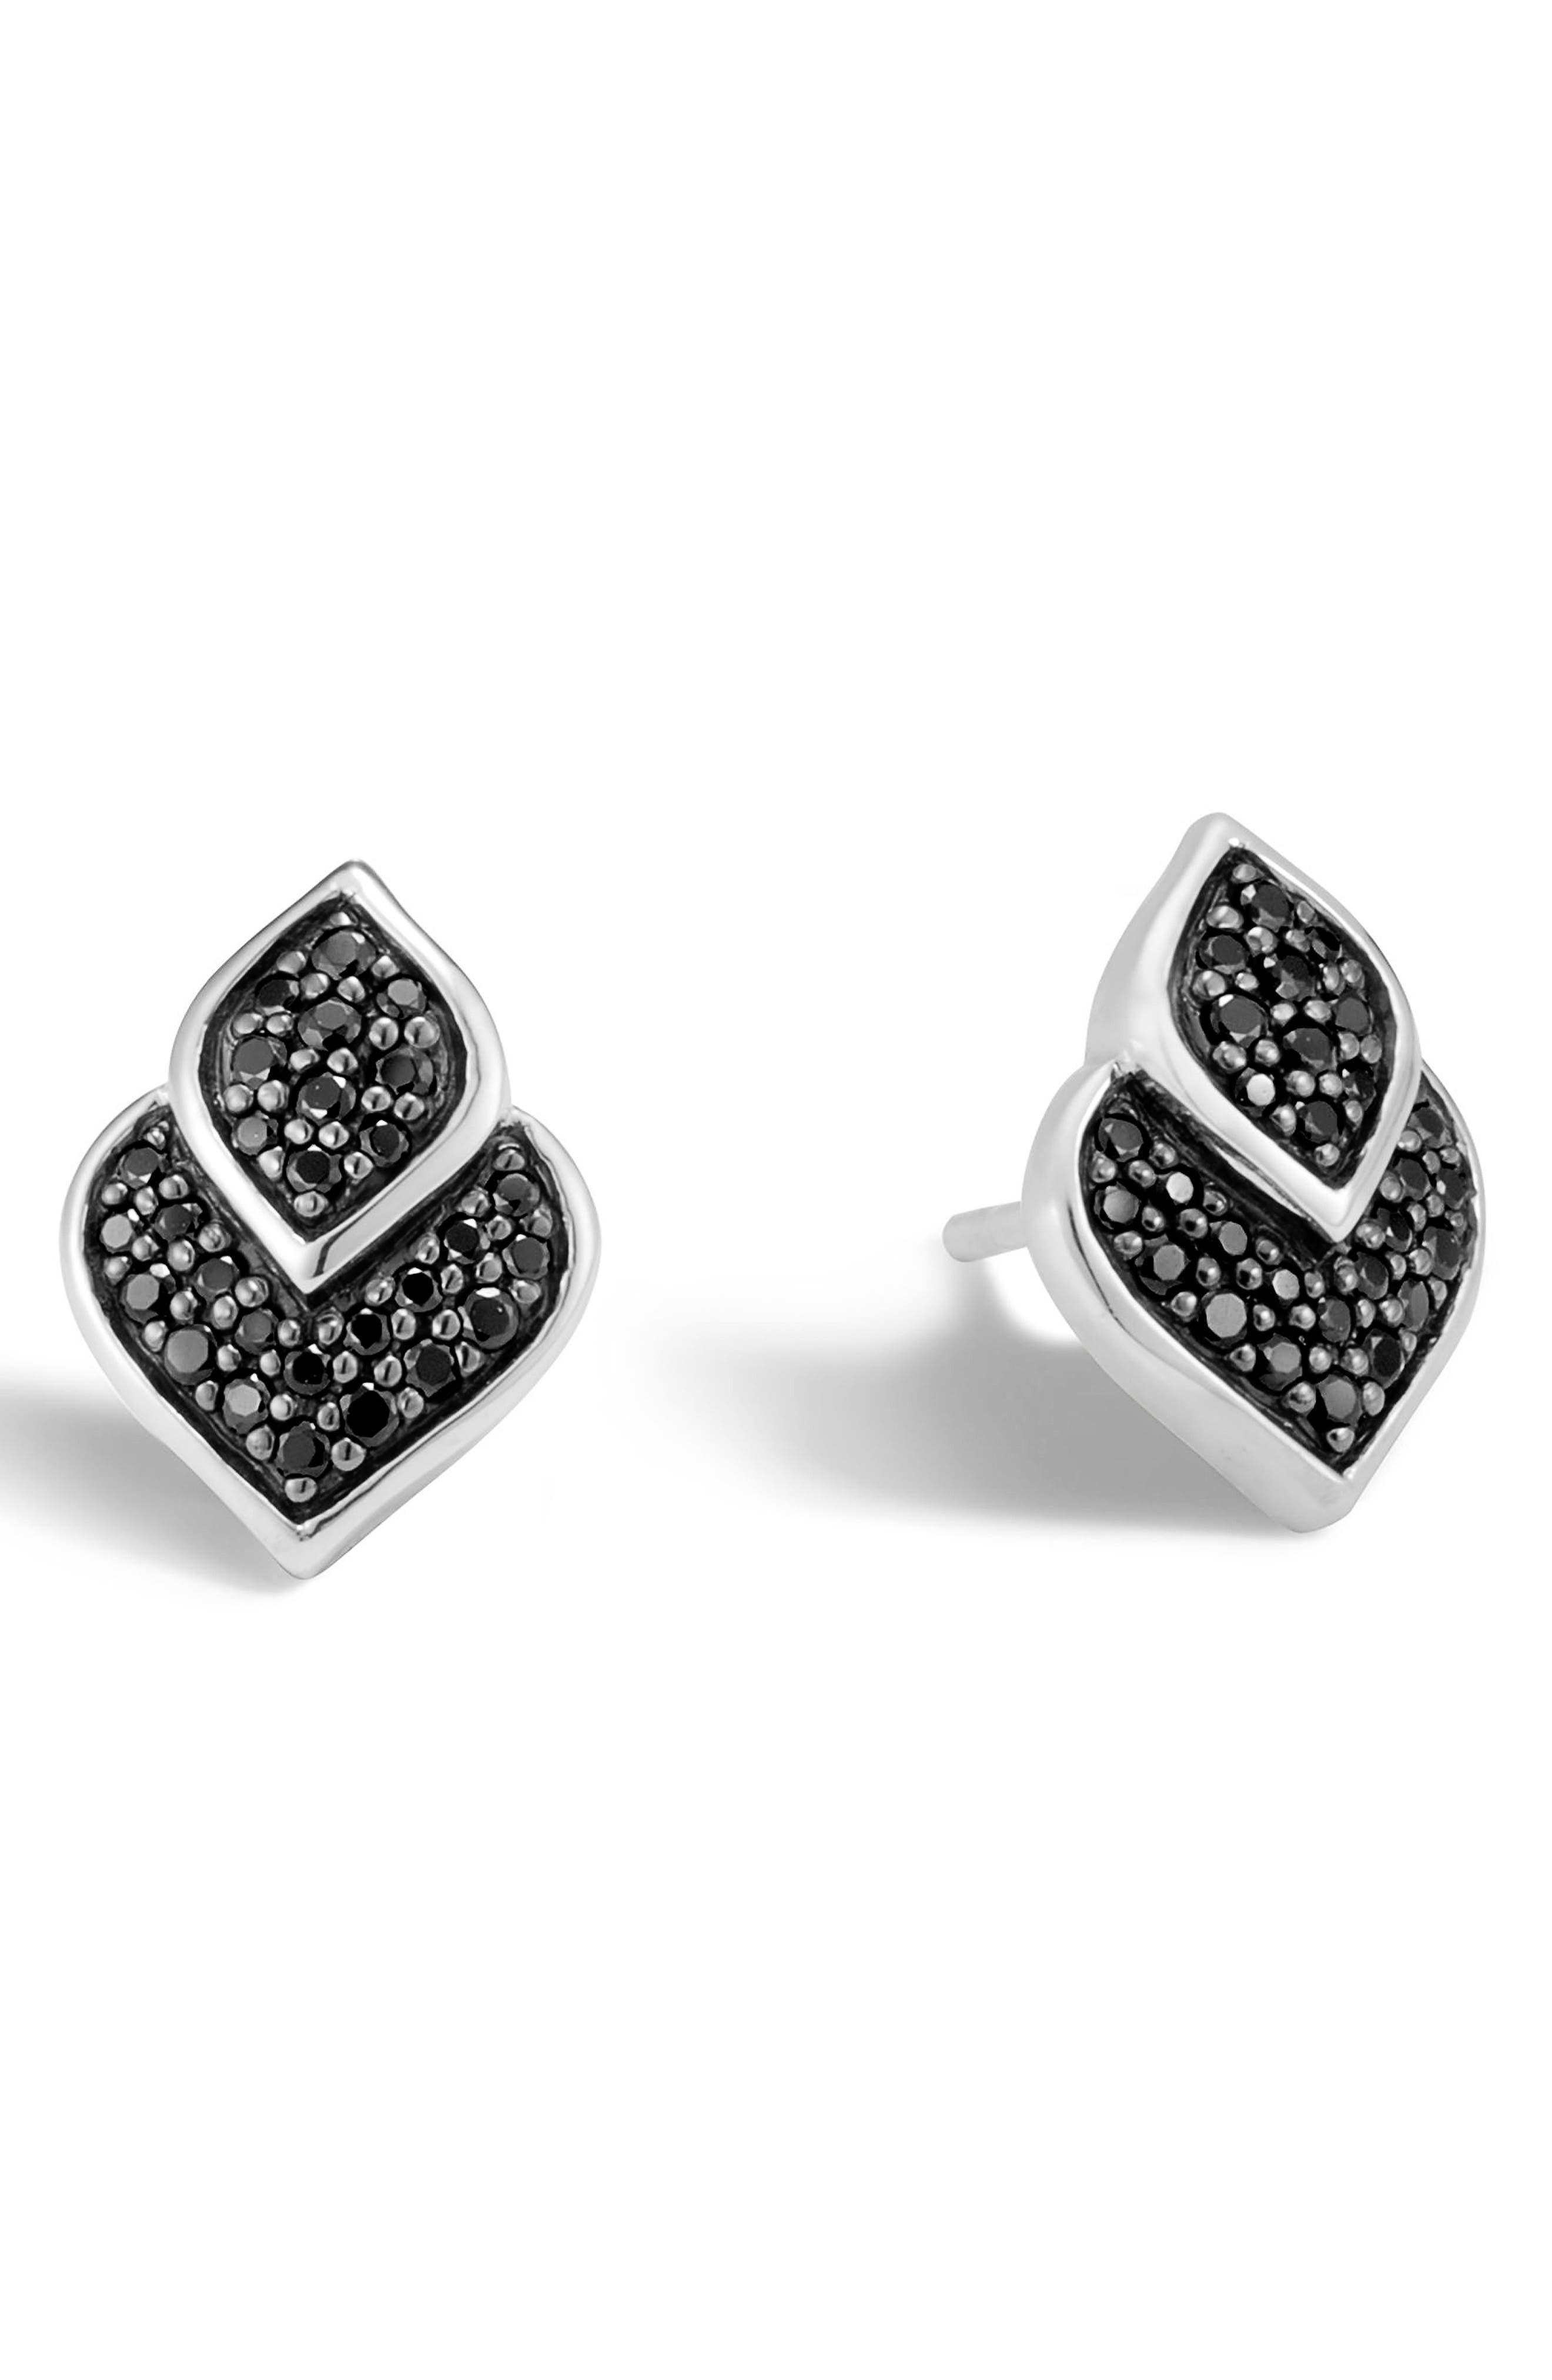 Main Image - John Hardy Legends Naga Stud Earrings